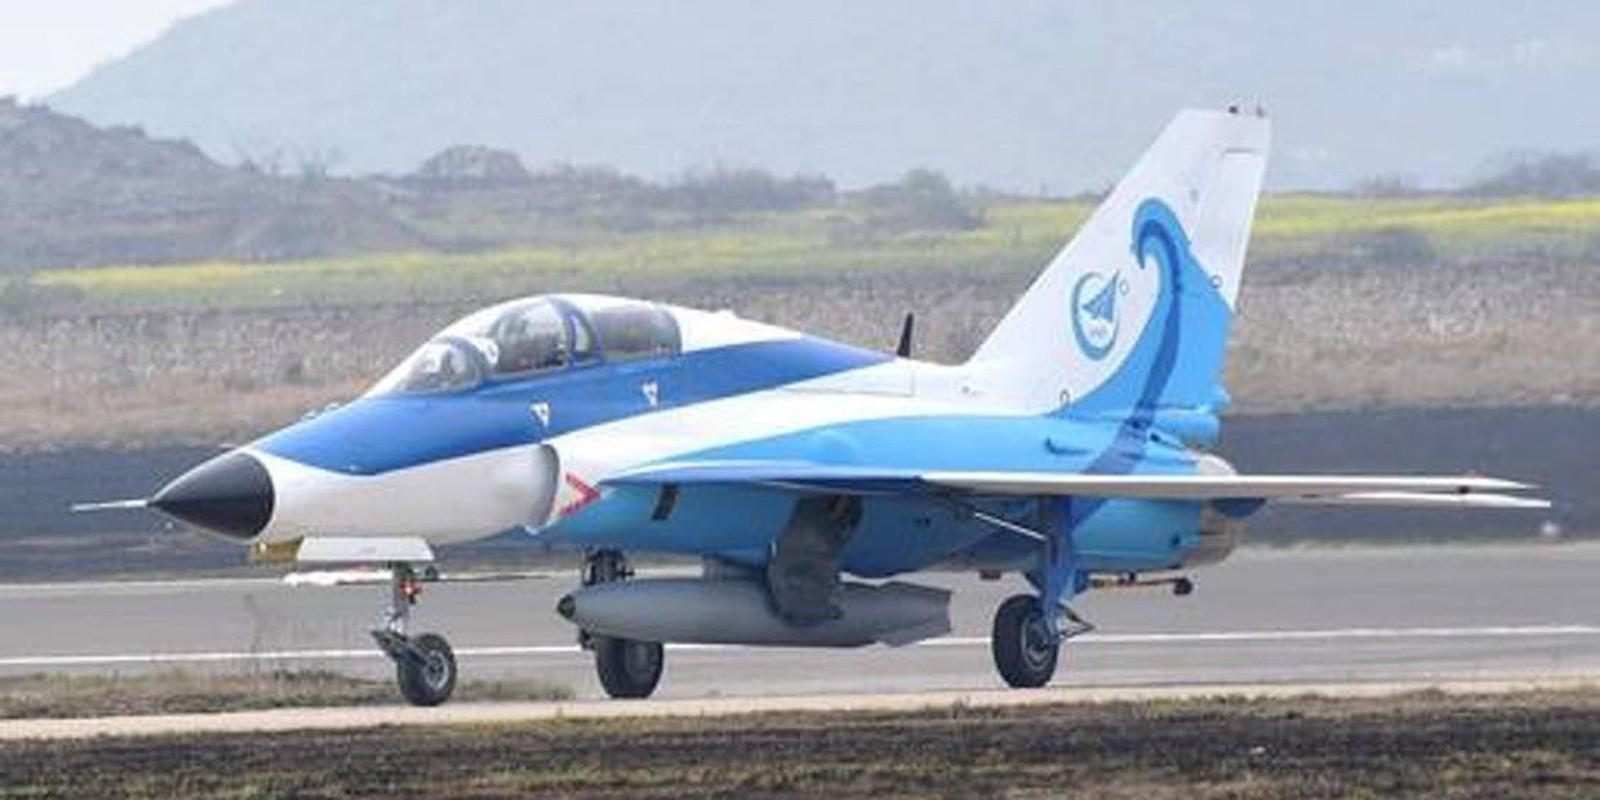 Sau hon nua the ky, Trung Quoc van miet mai che tao MiG-21-Hinh-15